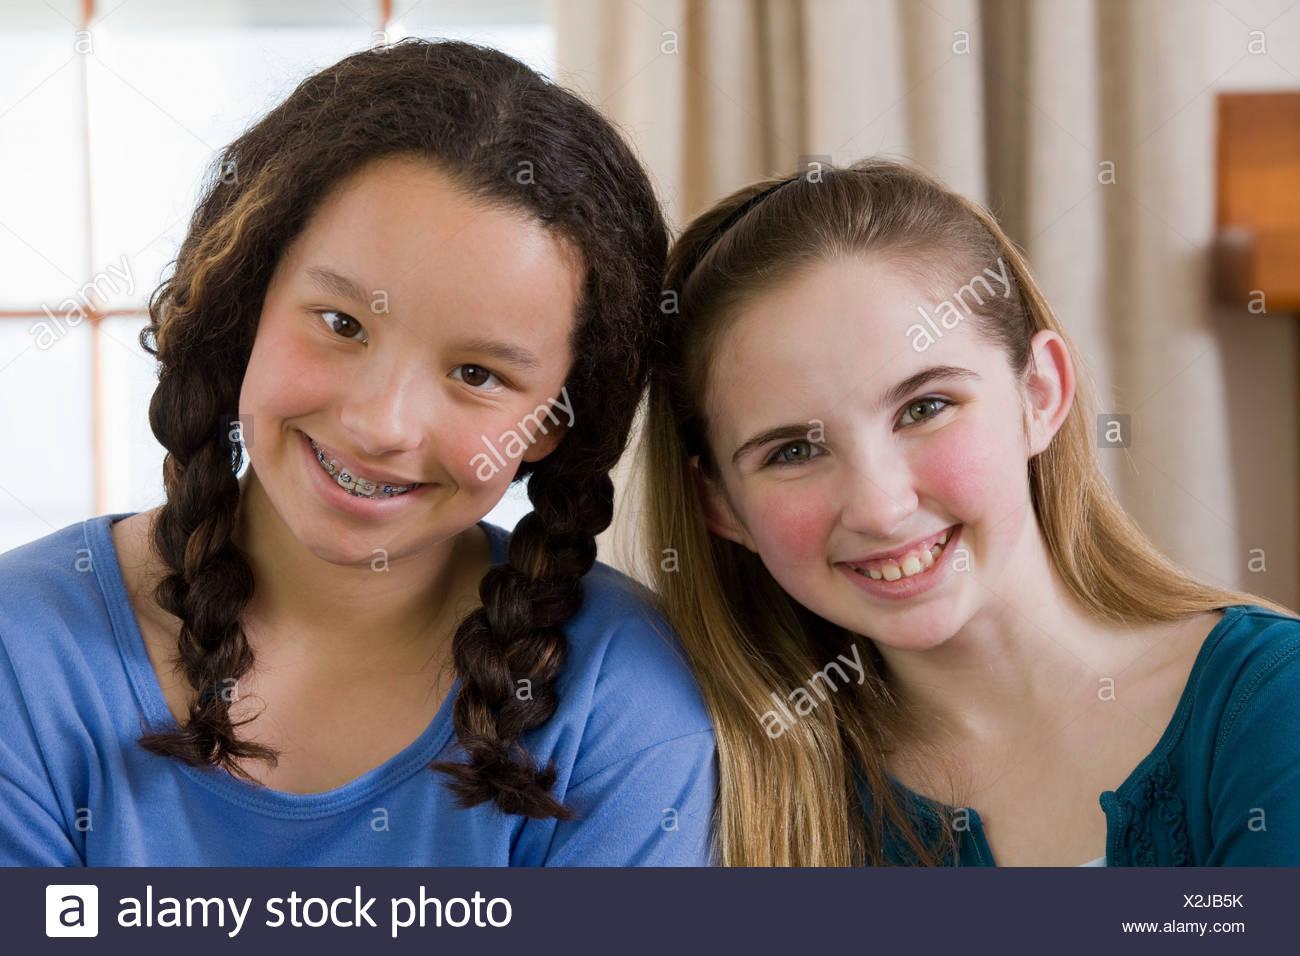 Retrato de dos chicas sonrientes Imagen De Stock